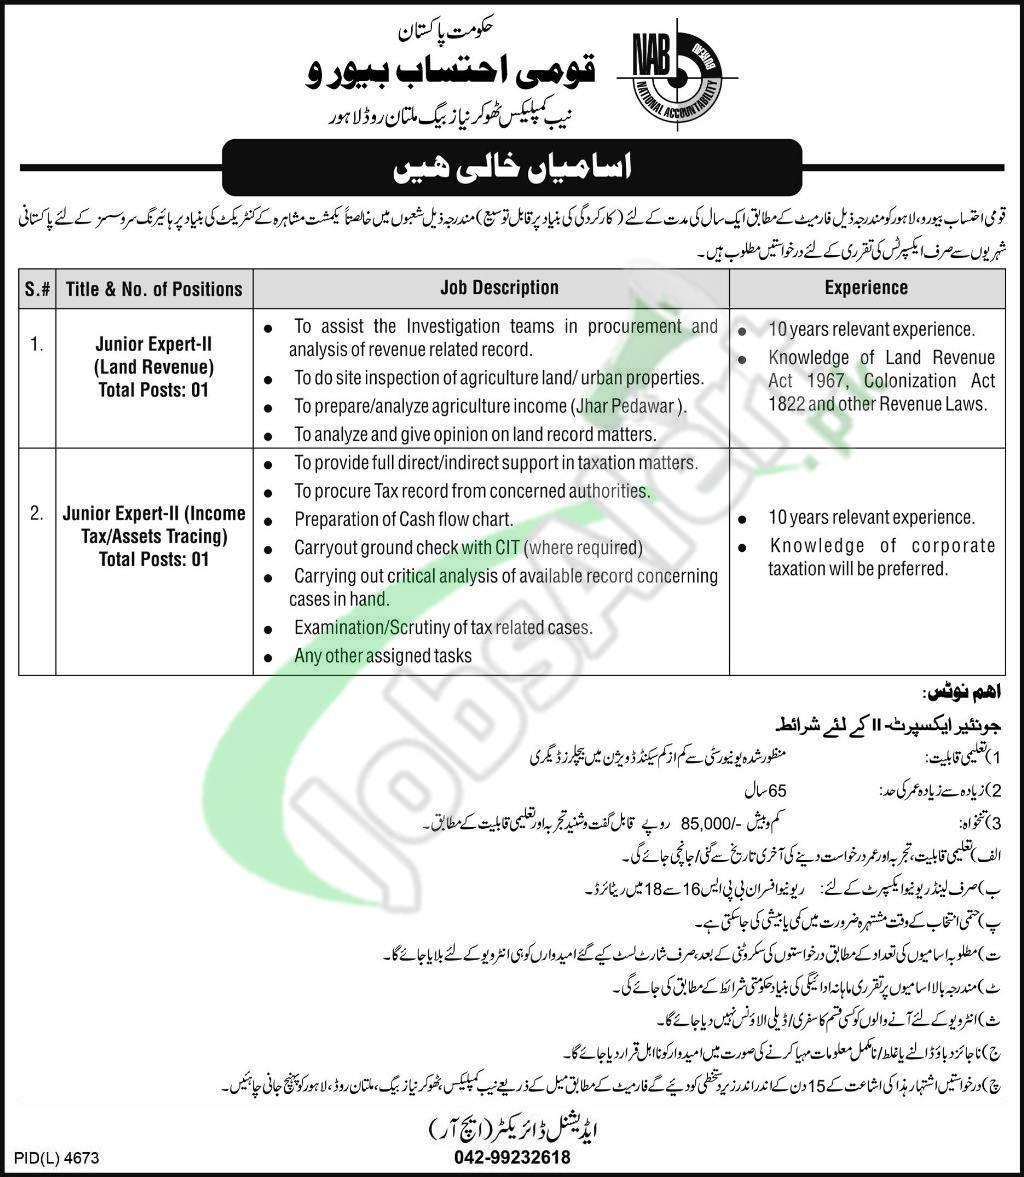 Nab Lahore Jobs Application Form Download Online